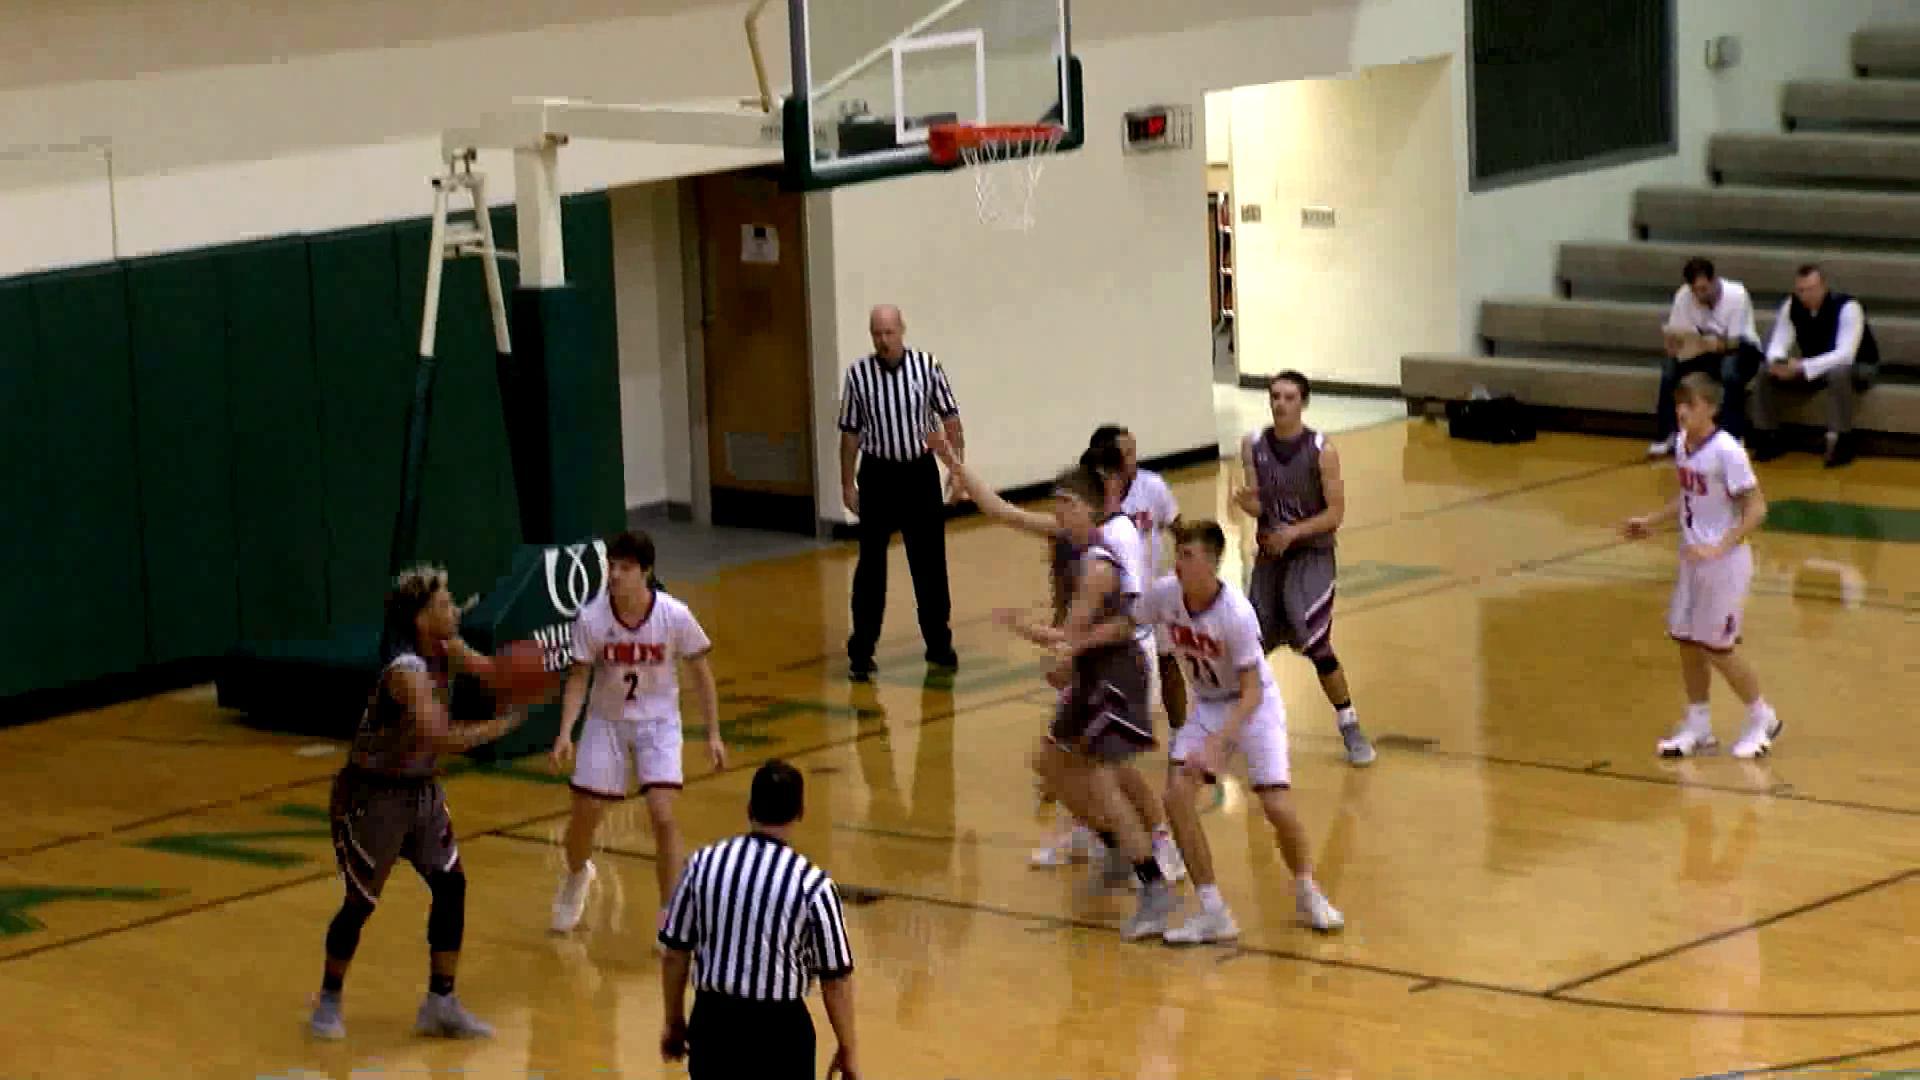 12.22.18 Highlights: Wheeling Central vs. Meadowbrook - boys basketball